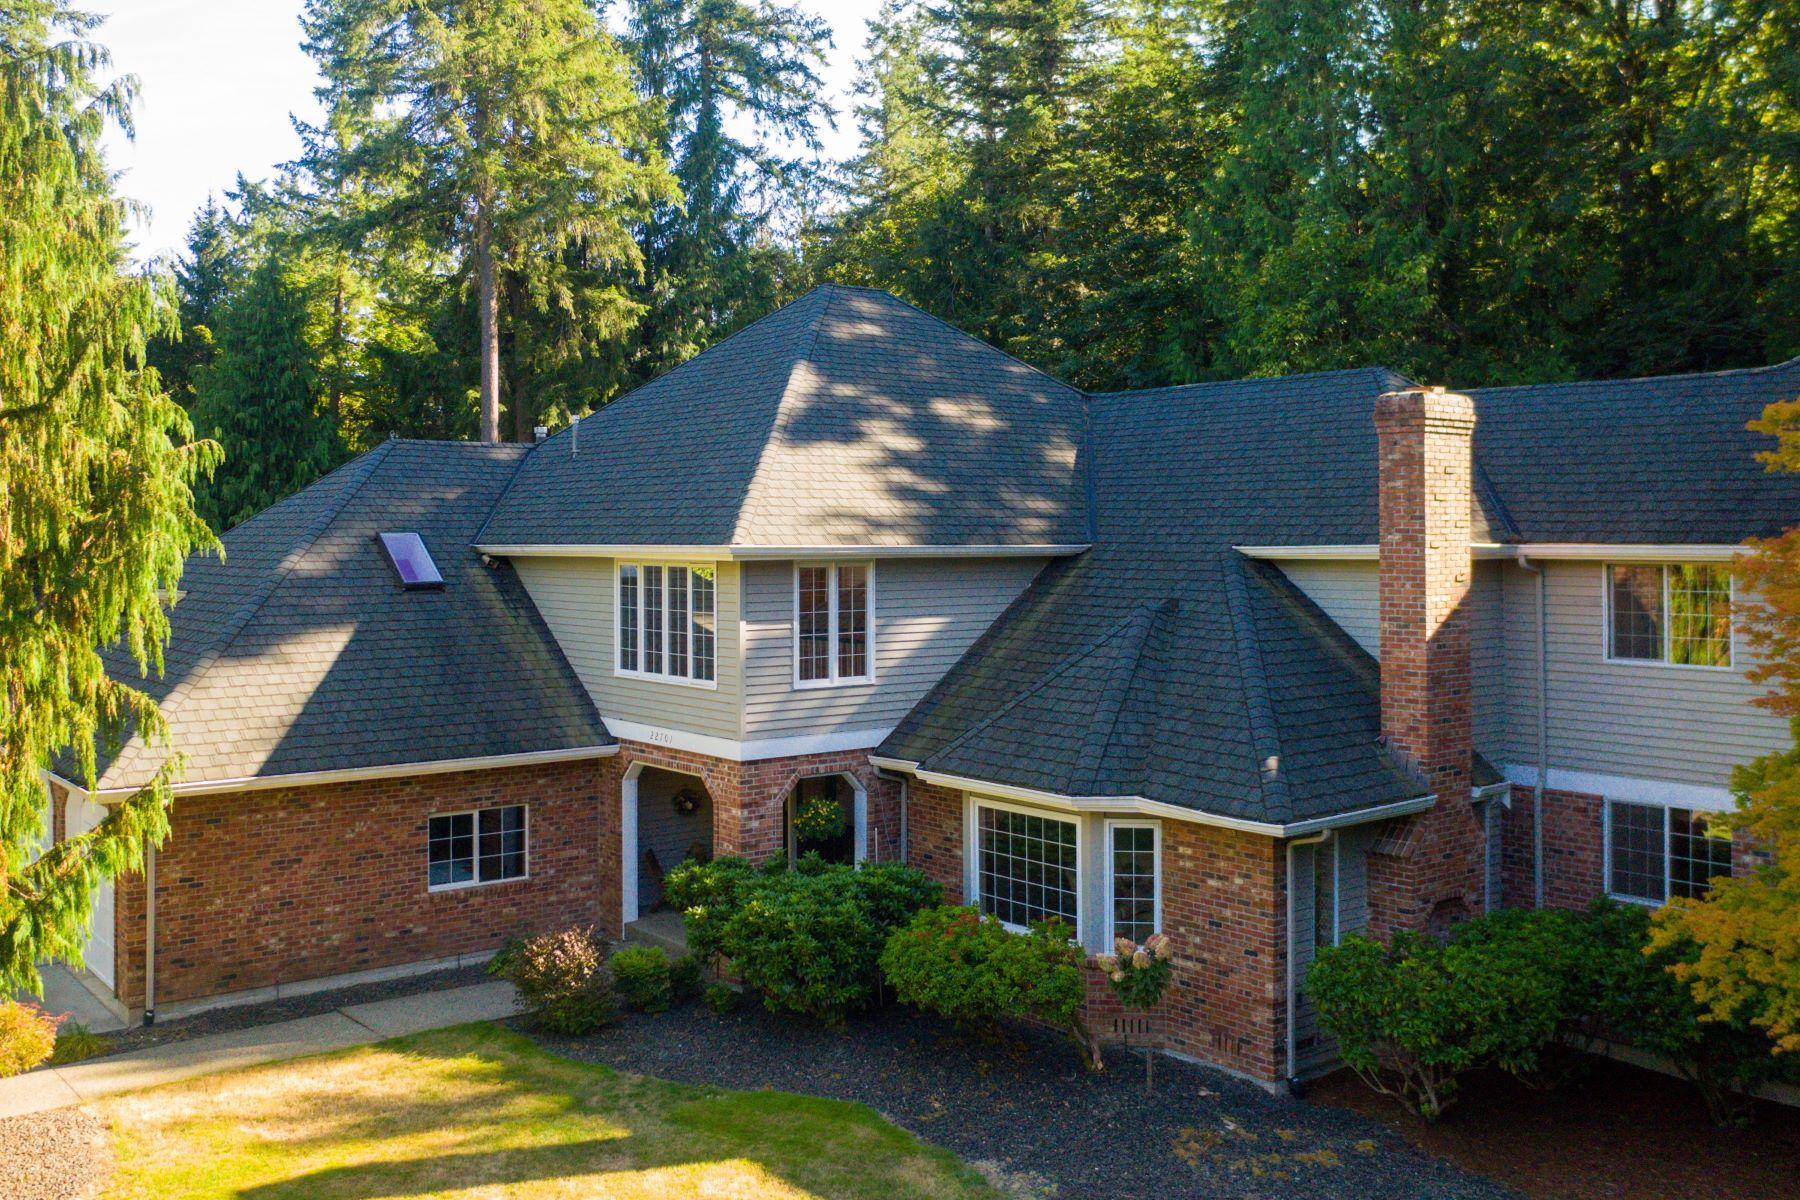 Single Family Homes for Sale at 22701 NE 57th Ct, Redmond, WA 98053 22701 NE 57th Ct Redmond, Washington 98053 United States